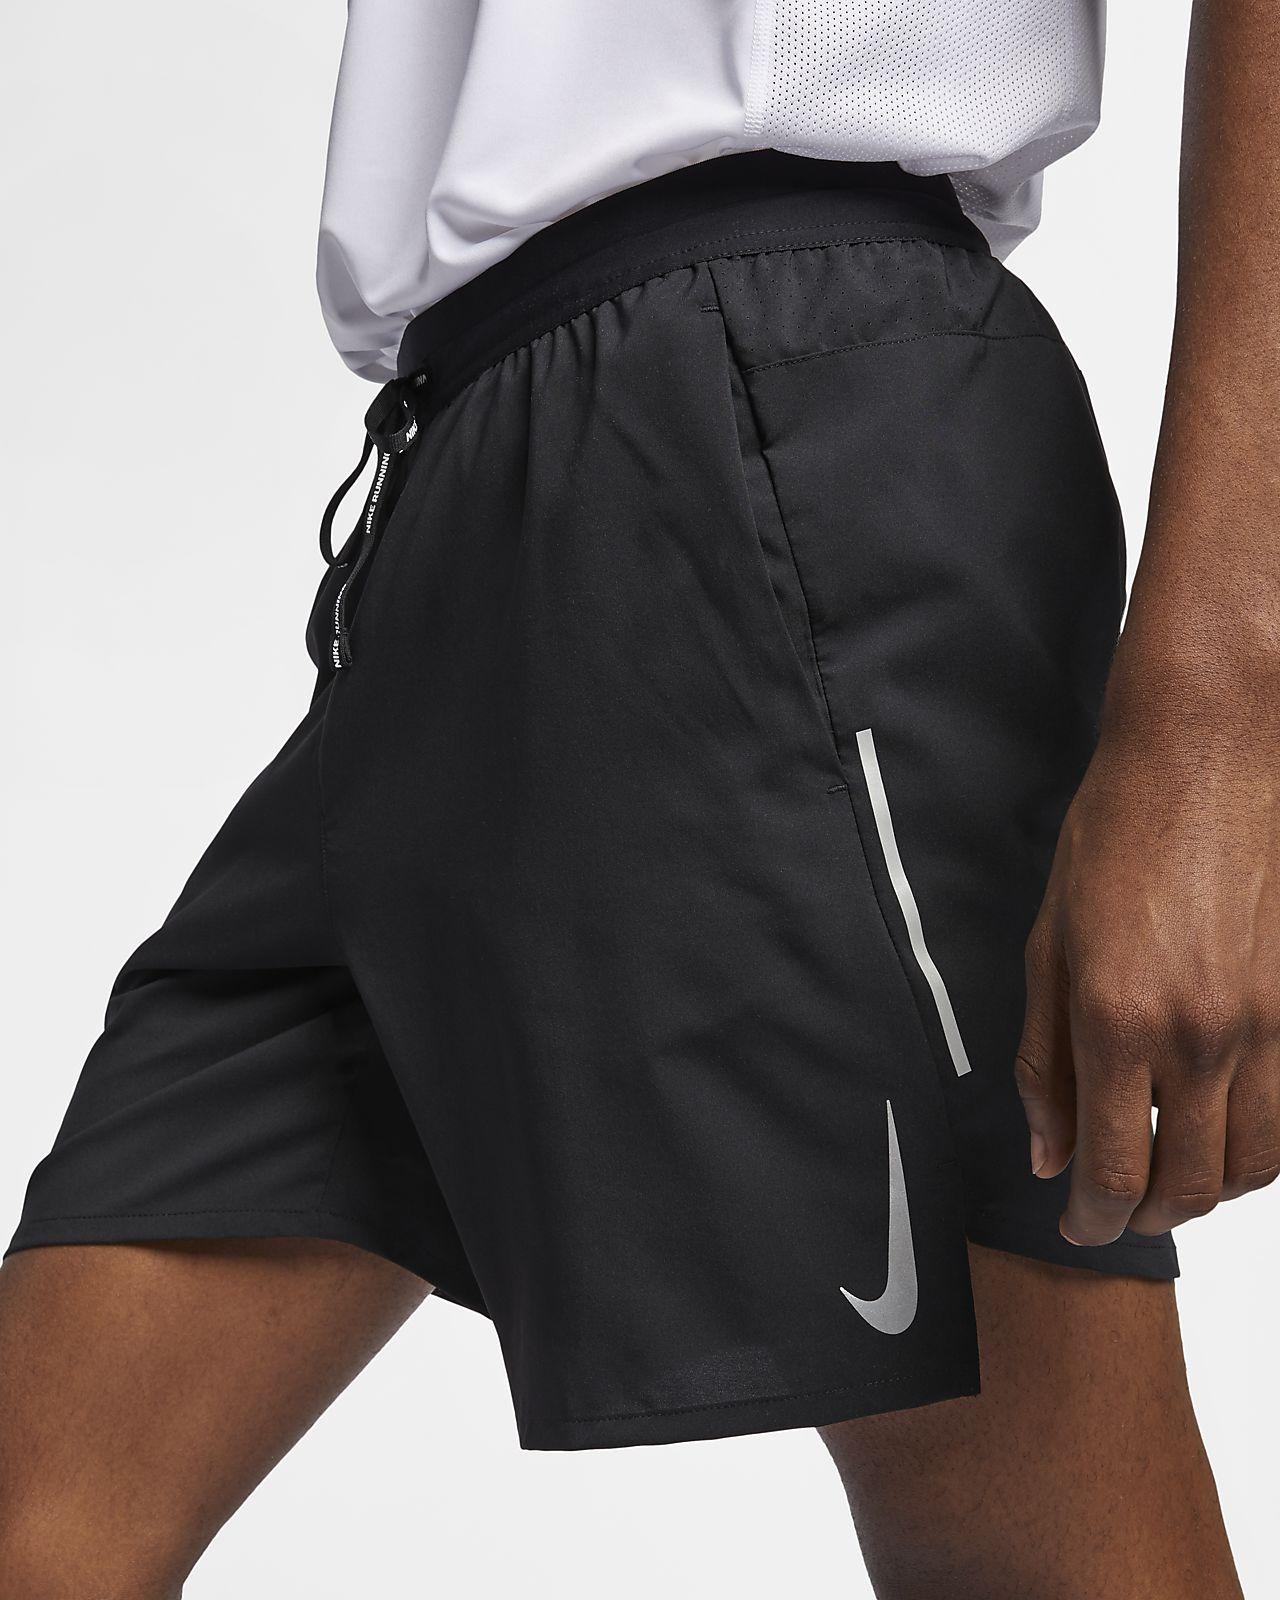 Nike Flex Stride fôret løpeshorts til herre (18 cm)